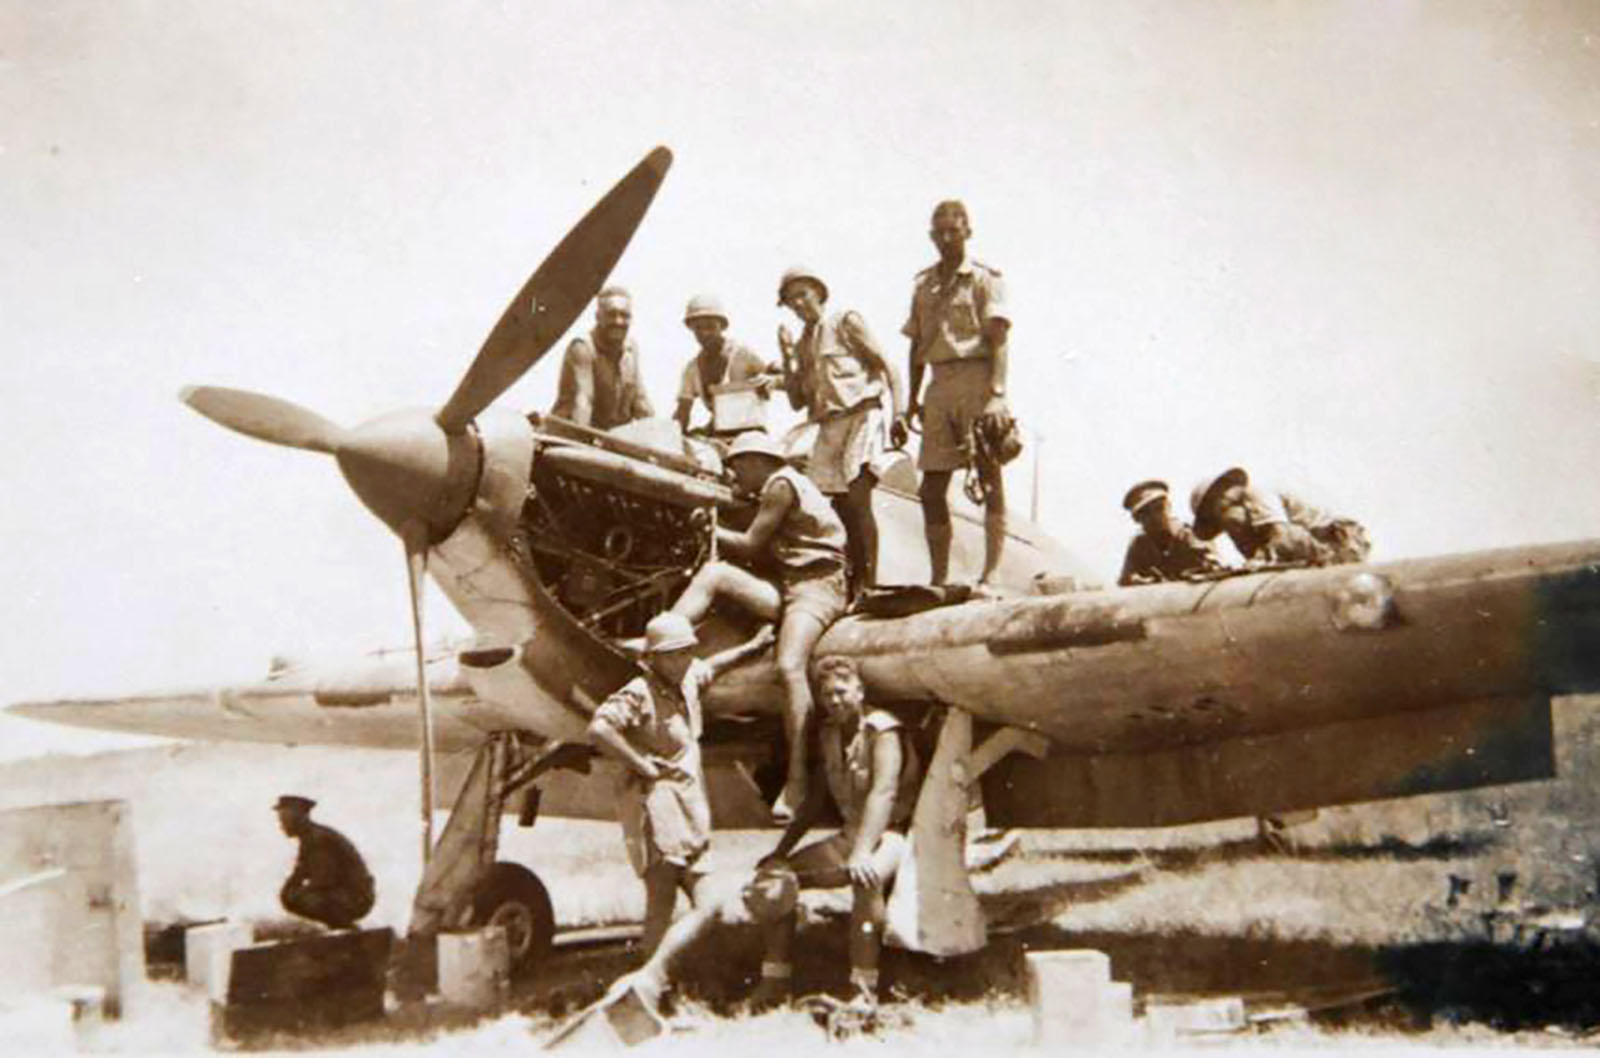 Hurricane I Trop SAAF 3Sqn U Bob Kershaw Dagahbur Ethiopia East Africa March 1941 05